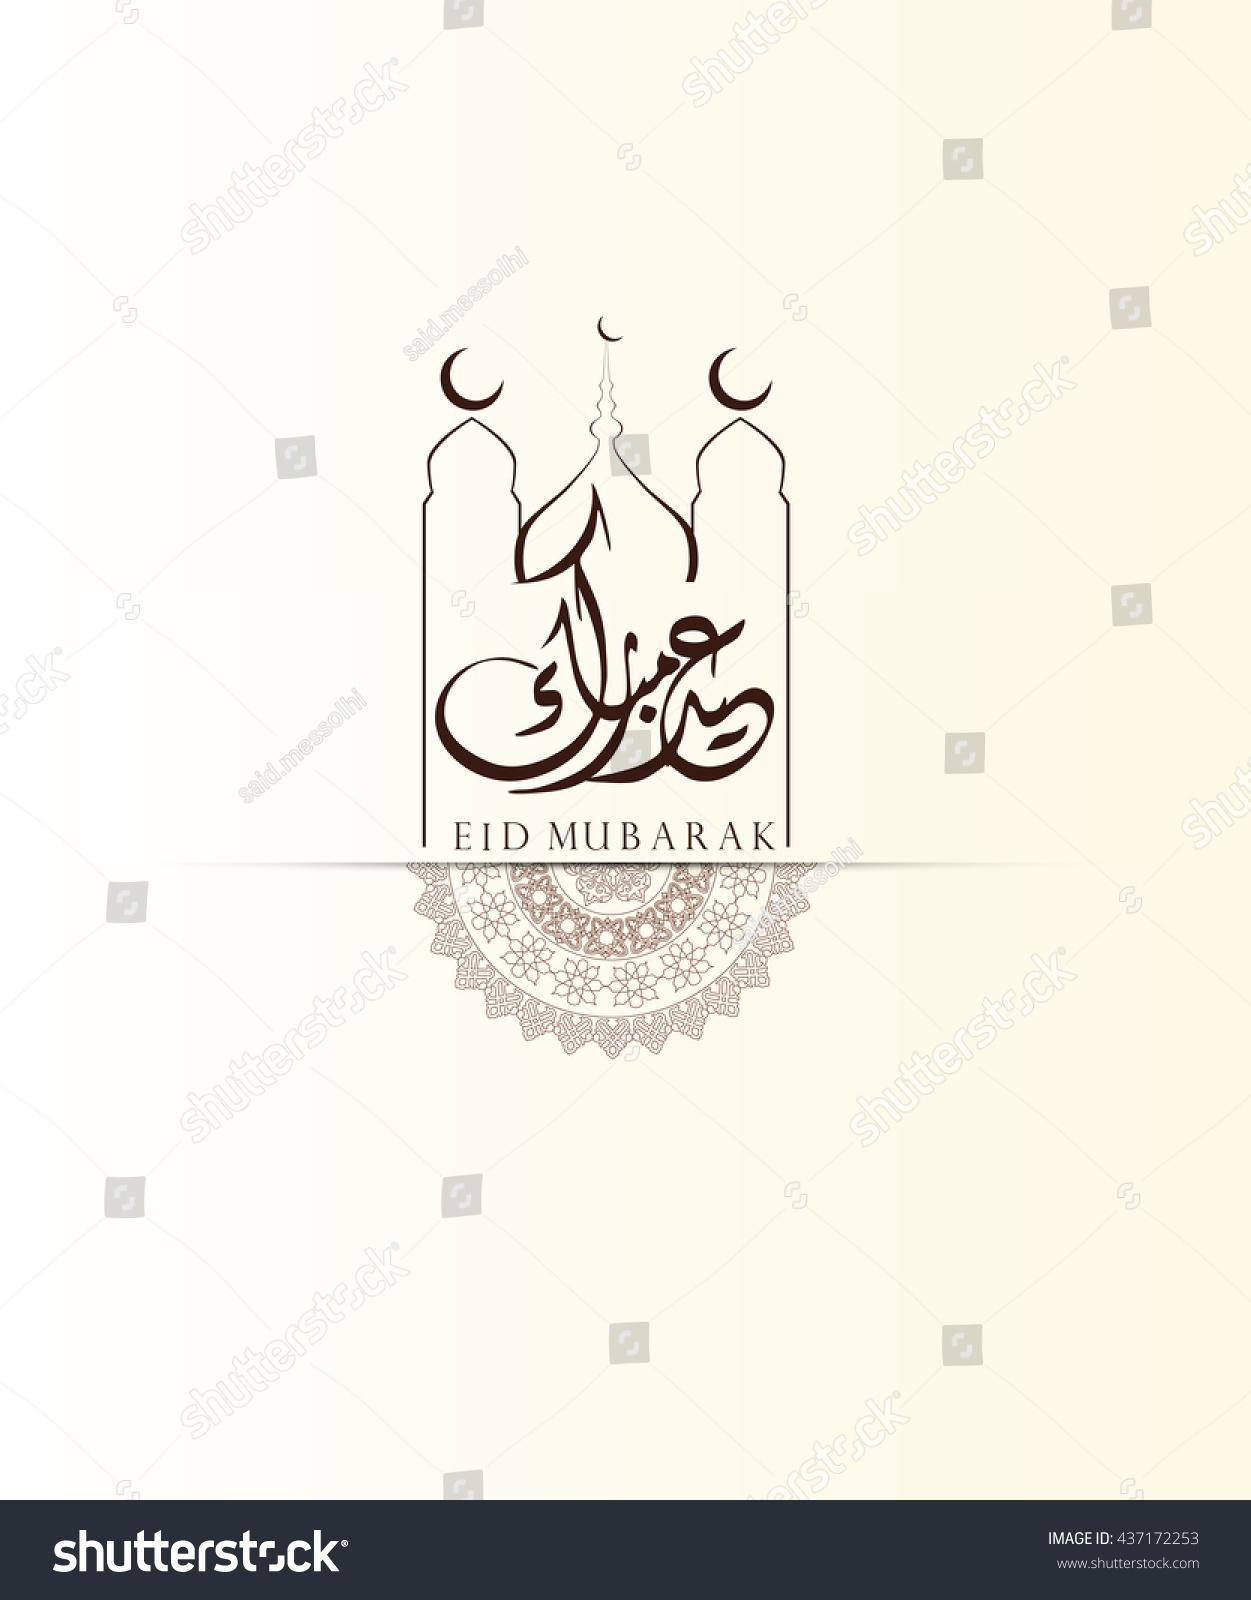 Top Eid Holiday Eid Al-Fitr Greeting - stock-vector-greeting-card-of-holiday-eid-al-fitr-mubarak-with-arabic-geometric-ornament-and-arabic-calligraphy-437172253  Collection_548349 .jpg